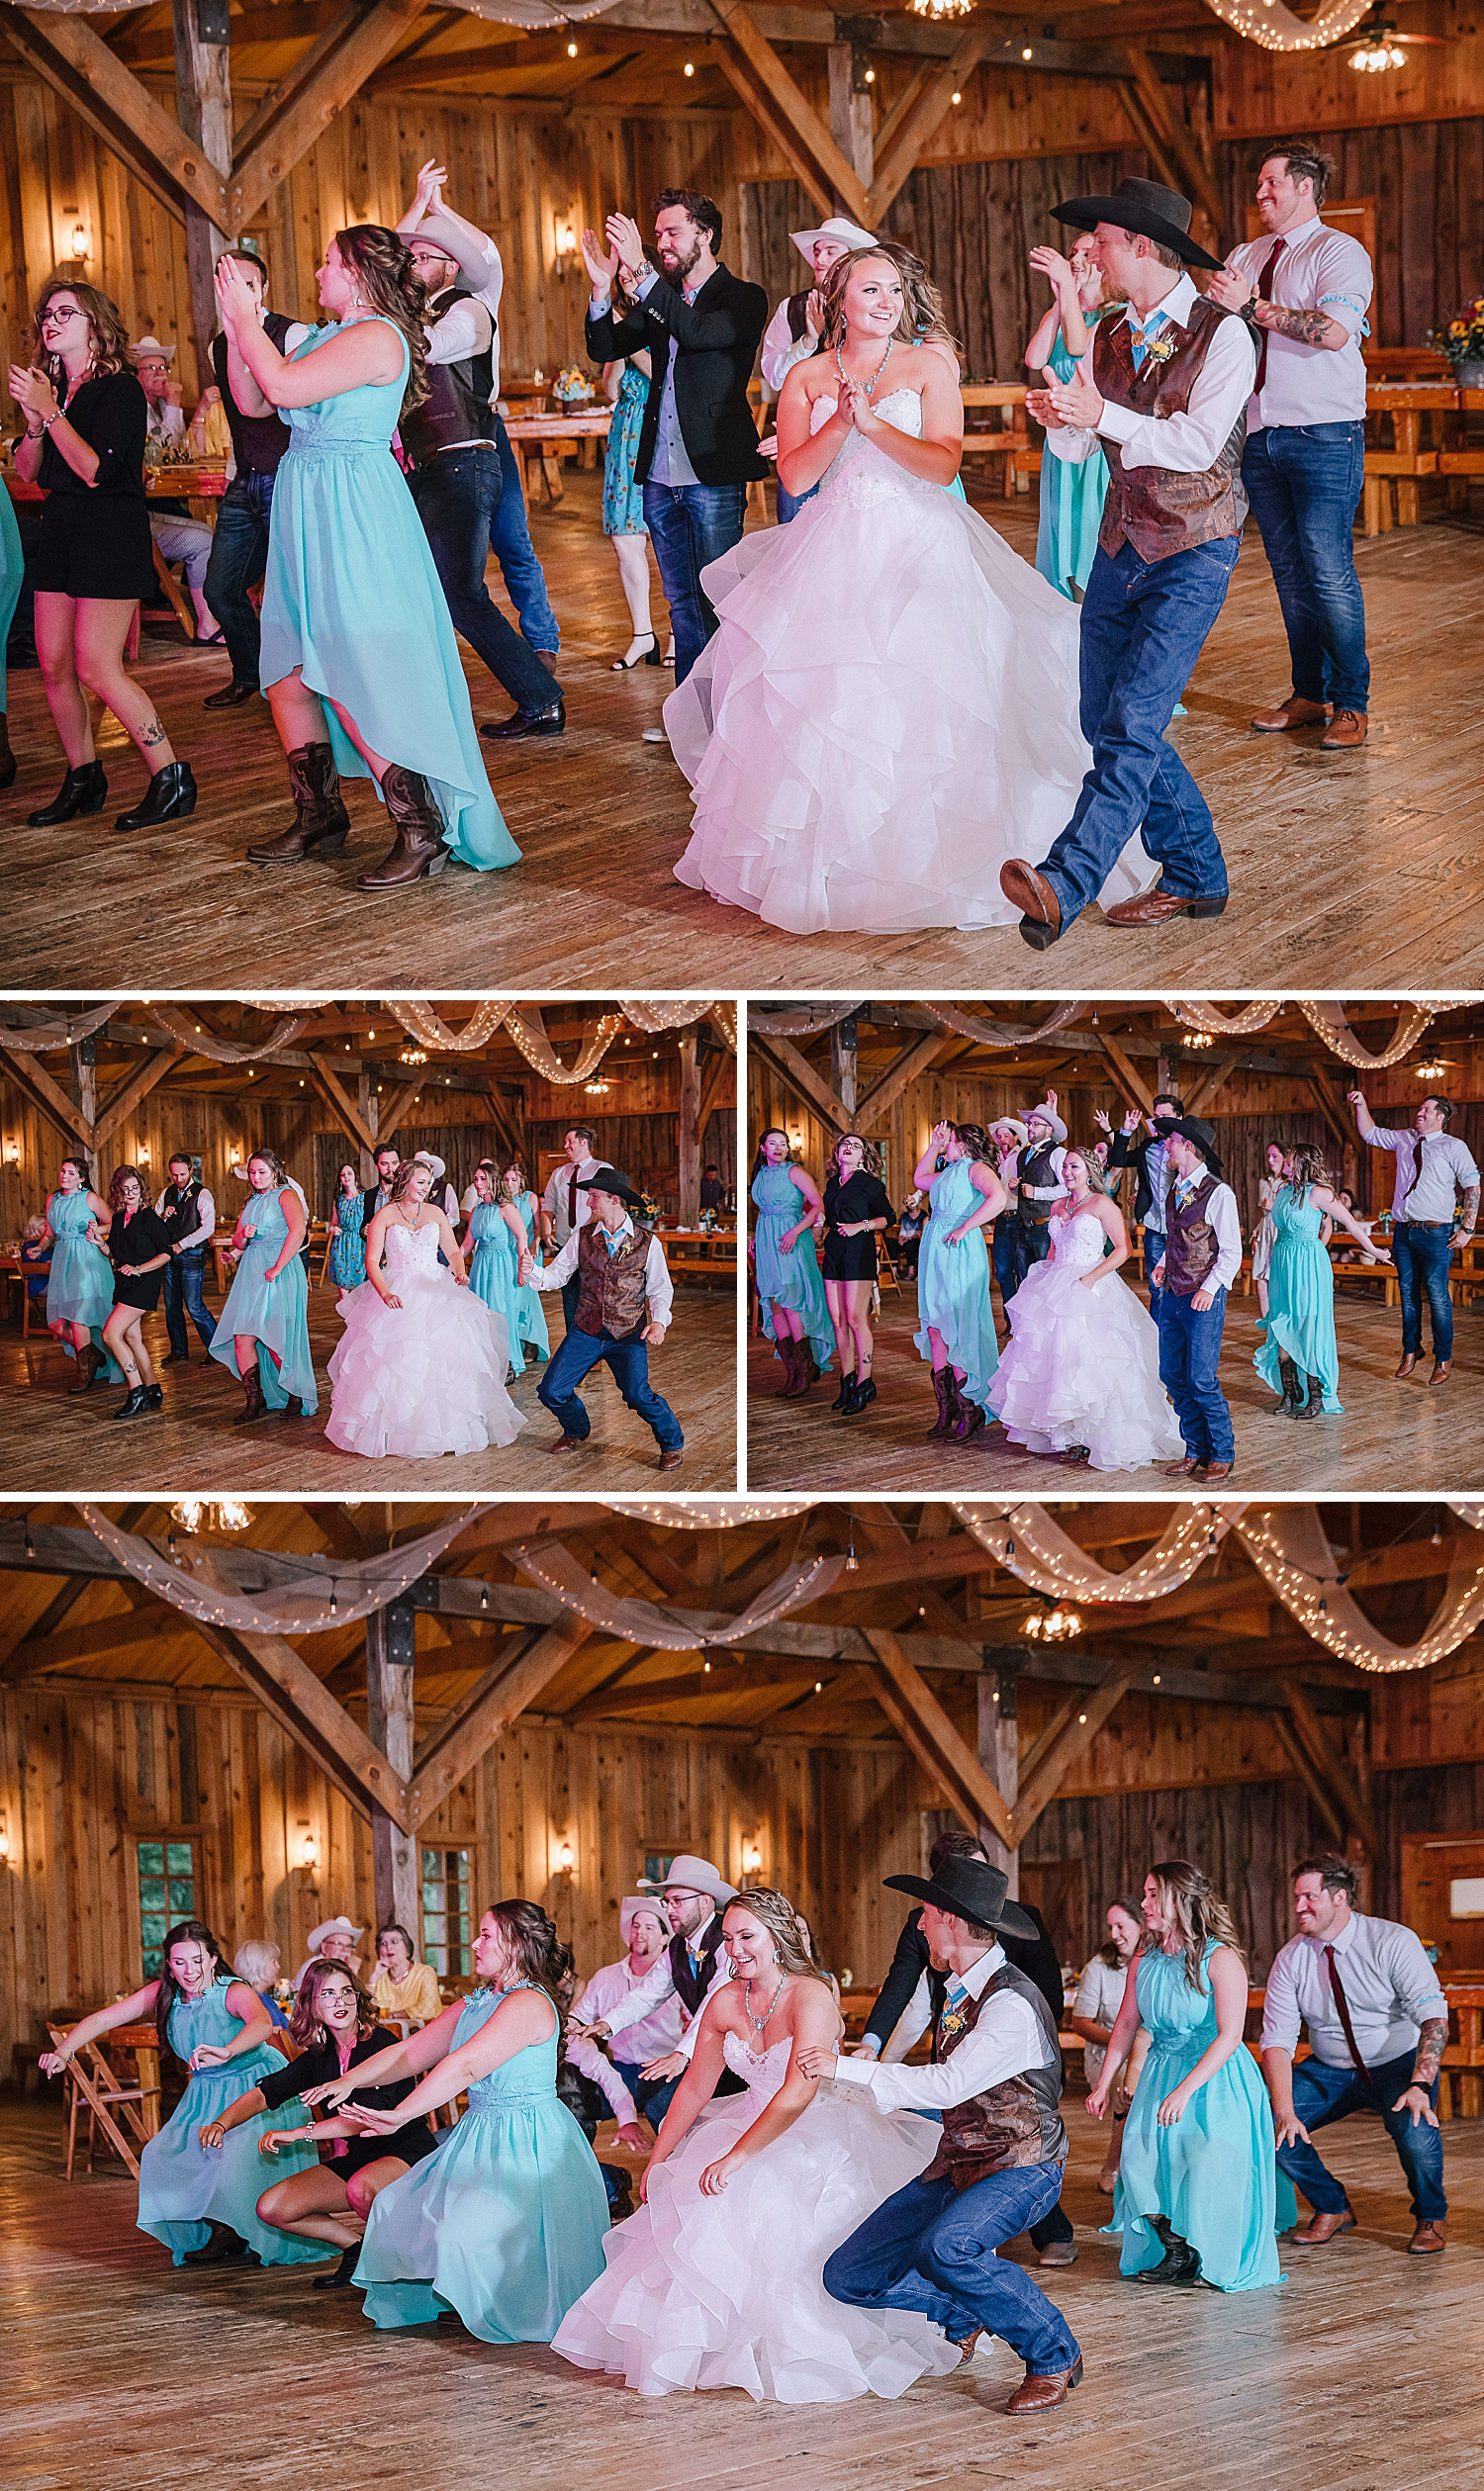 Carly-Barton-Photography-Old-Town-Texas-Rustic-Wedding-Photos-Sunflowers-Boots-Kyle-Texas_0074.jpg